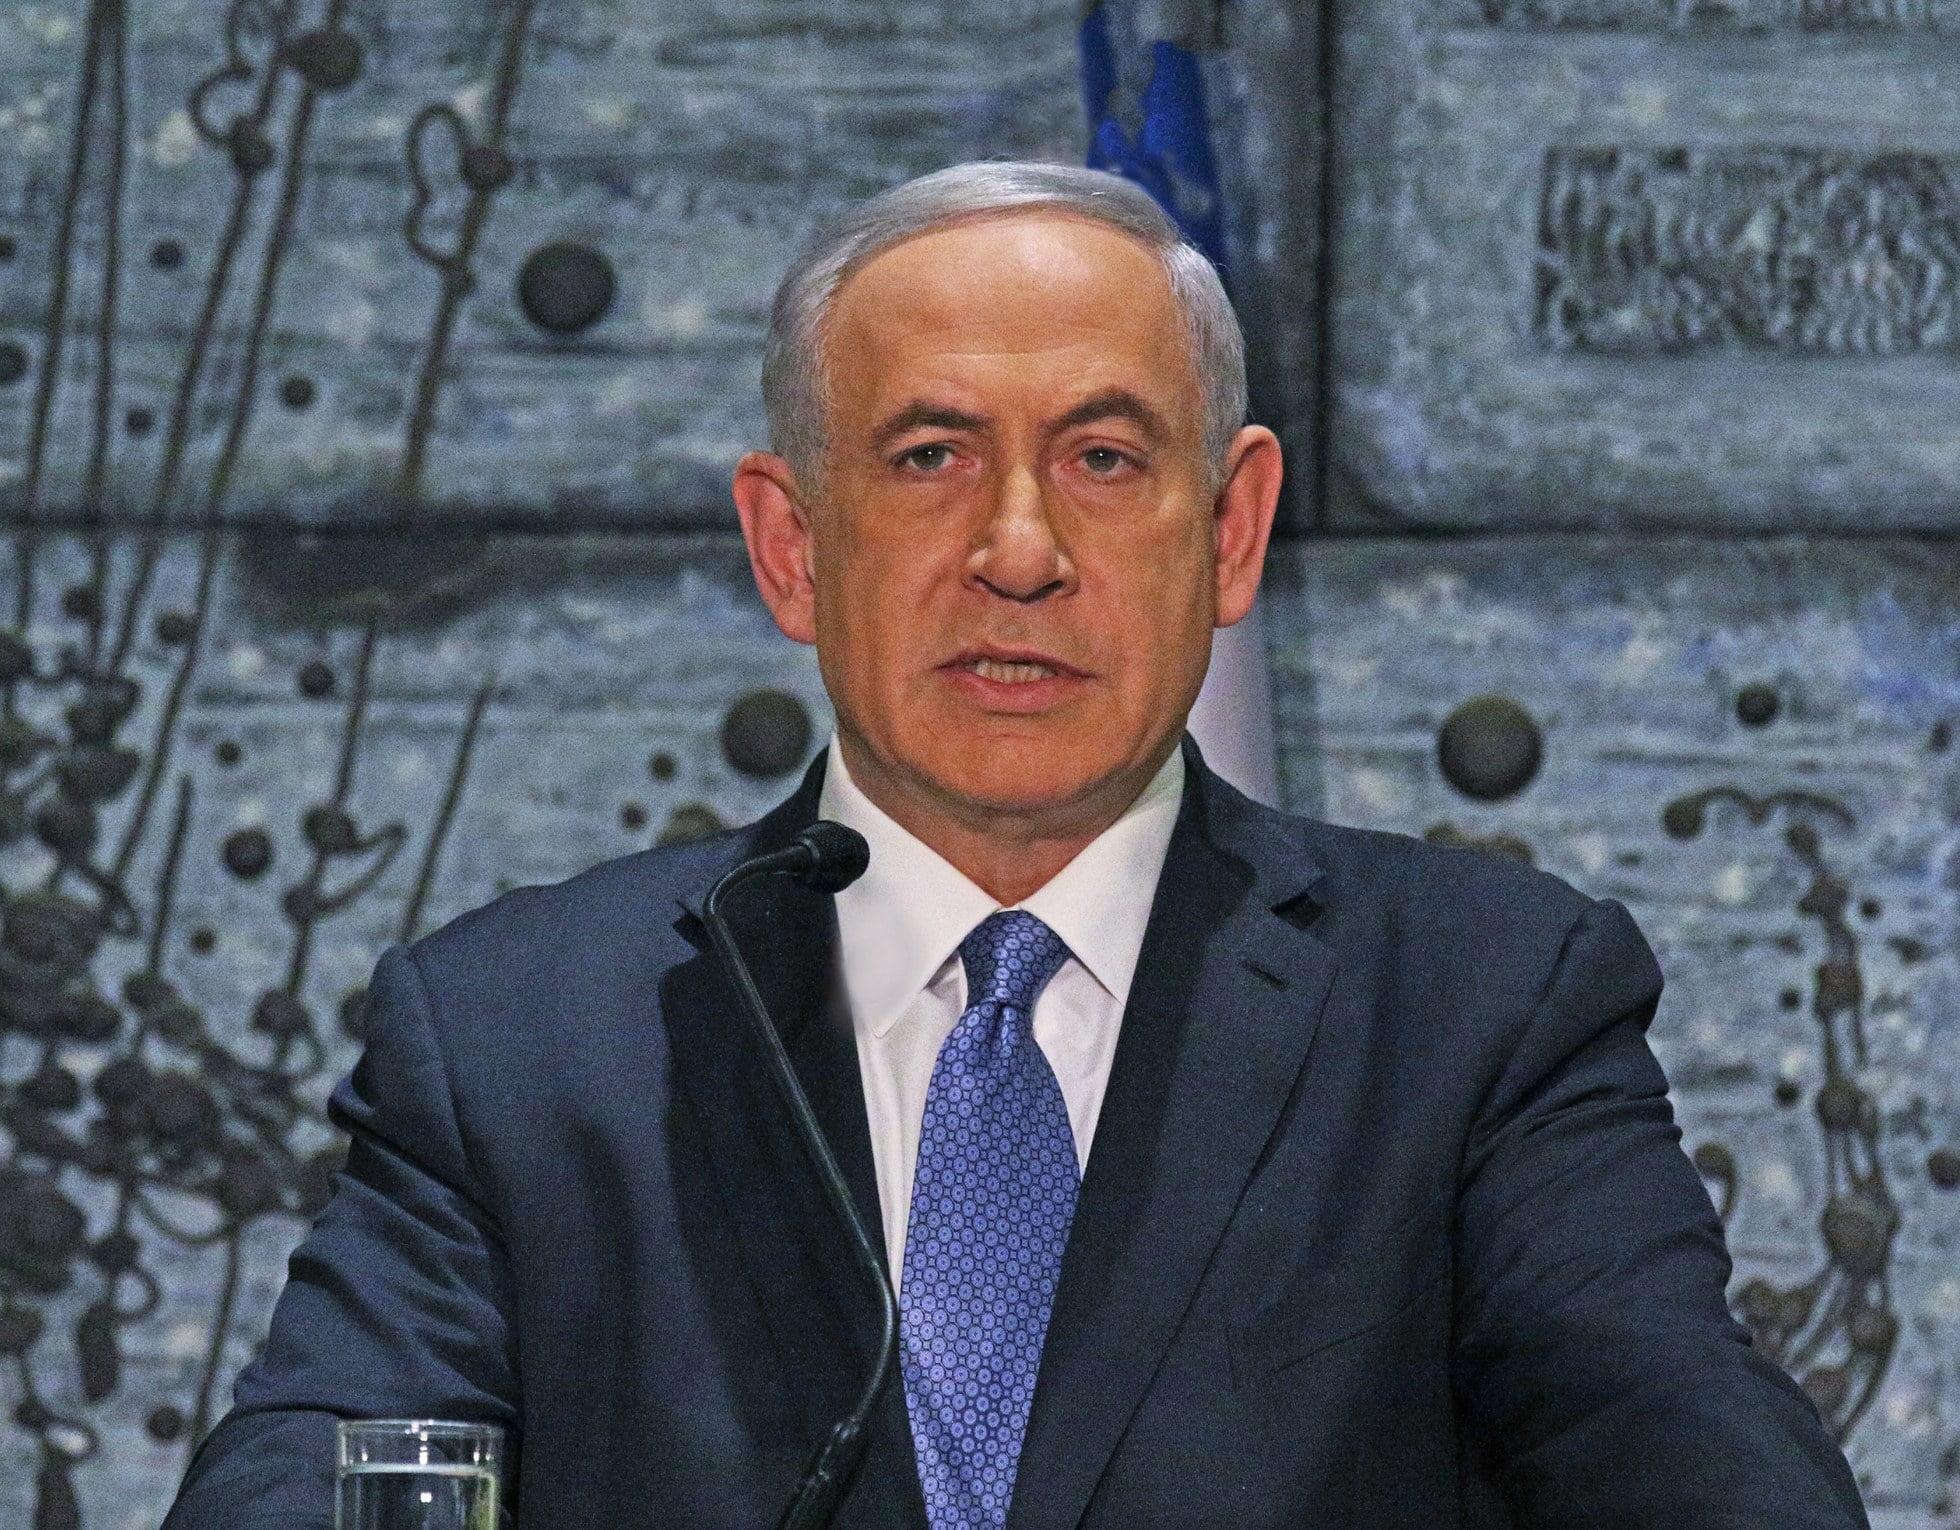 Netanyahu Advised to Dress Israel Up as Democracy This Halloween